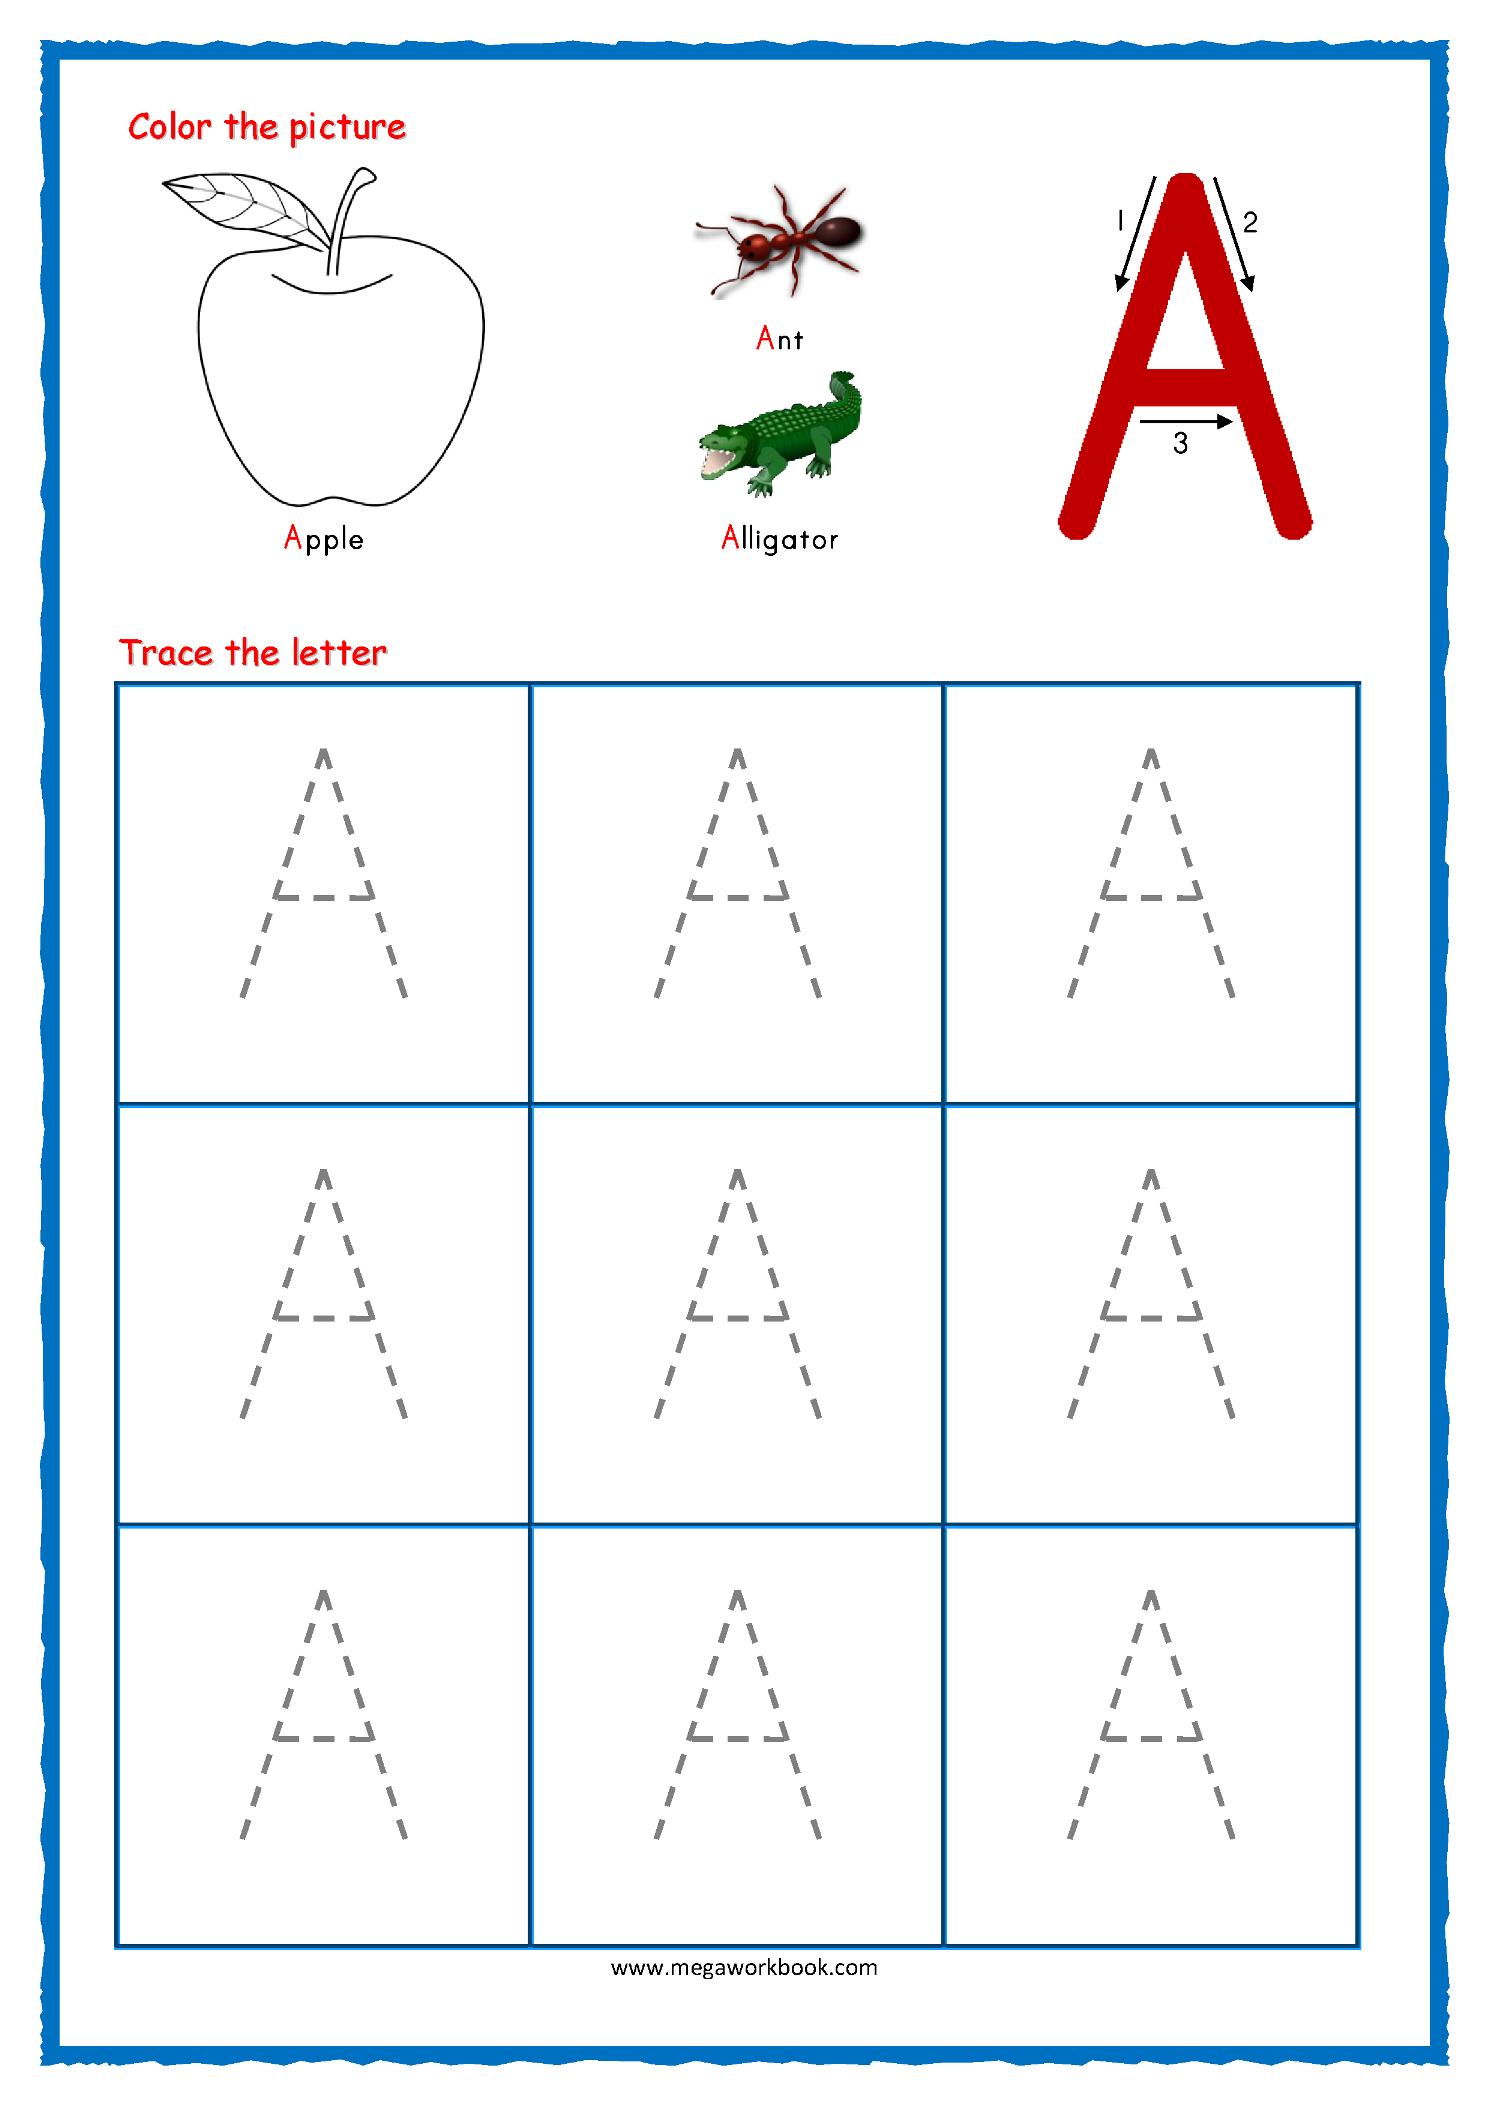 Tracing Letters - Alphabet Tracing - Capital Letters regarding Alphabet Tracing Kindergarten